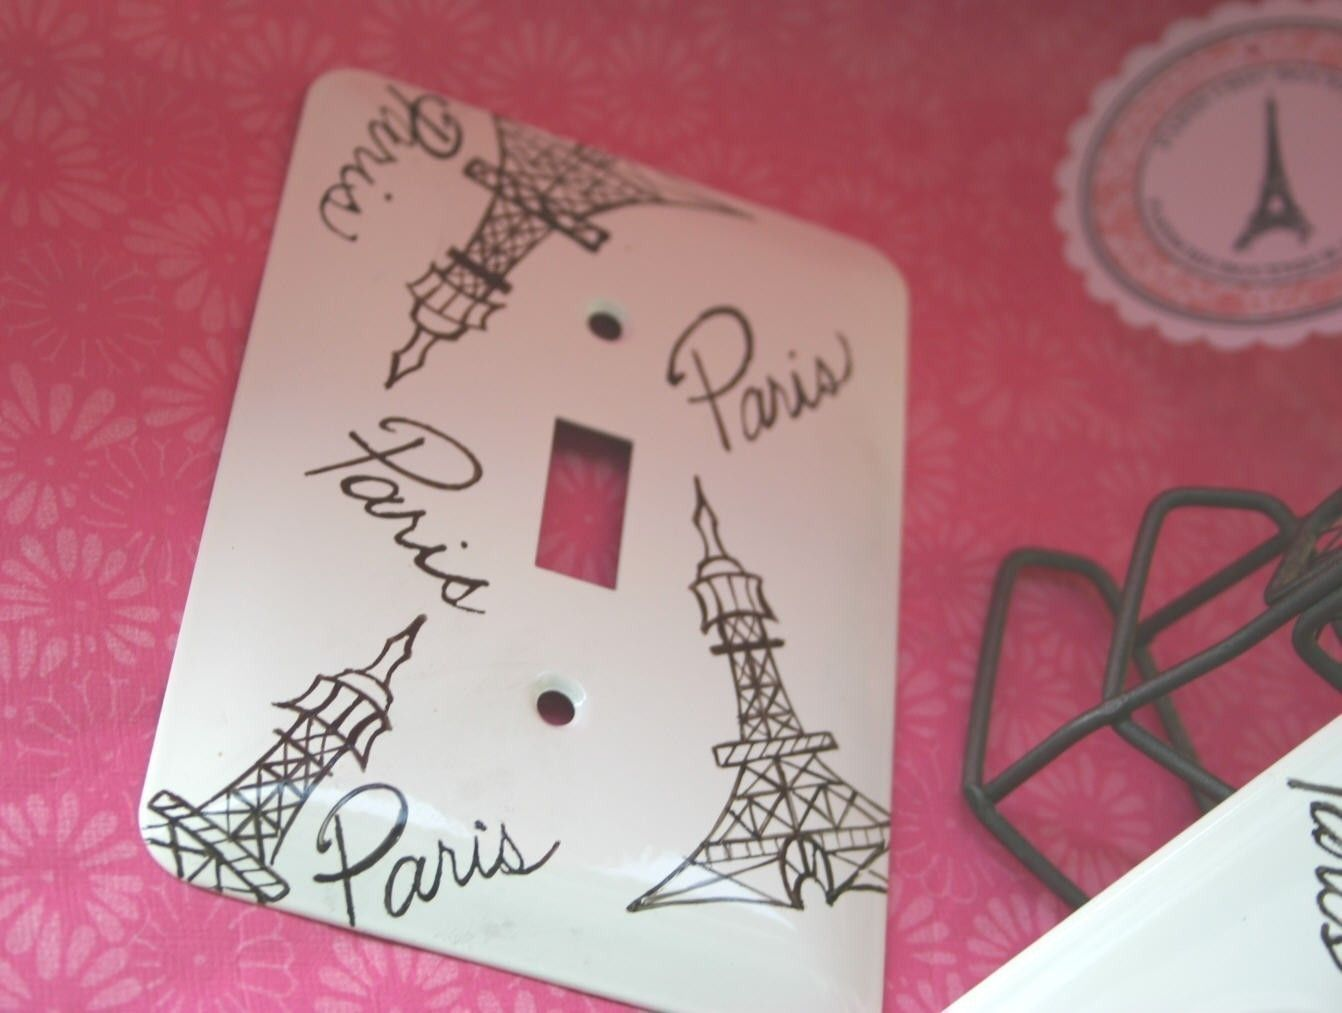 Paris Themed Bedroom Decorating 17 Best Images About Mya Room On Pinterest Burgundy Paris